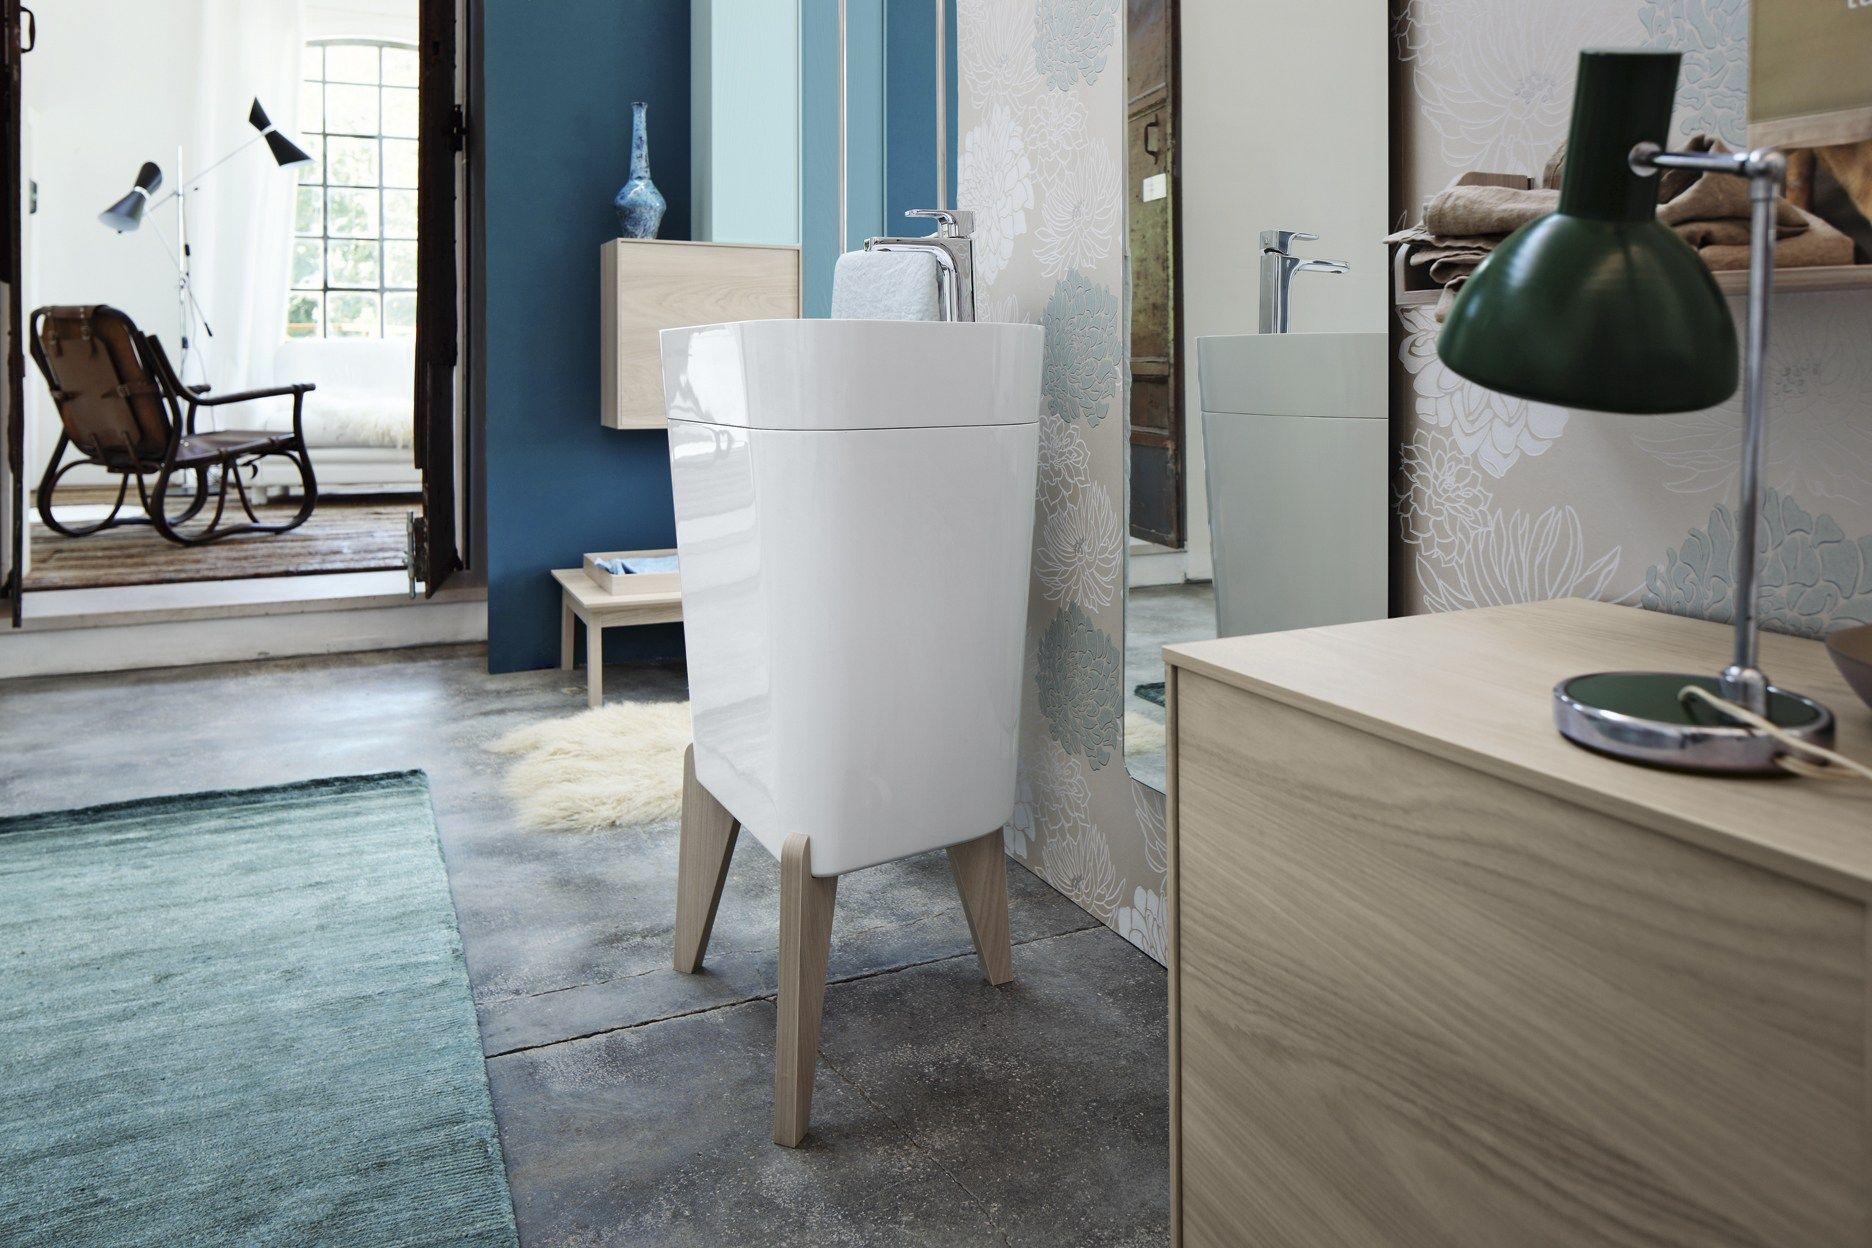 Bathroom furniture set FREE 38/39 by Cerasa design Stefano Spessotto, Lorella...